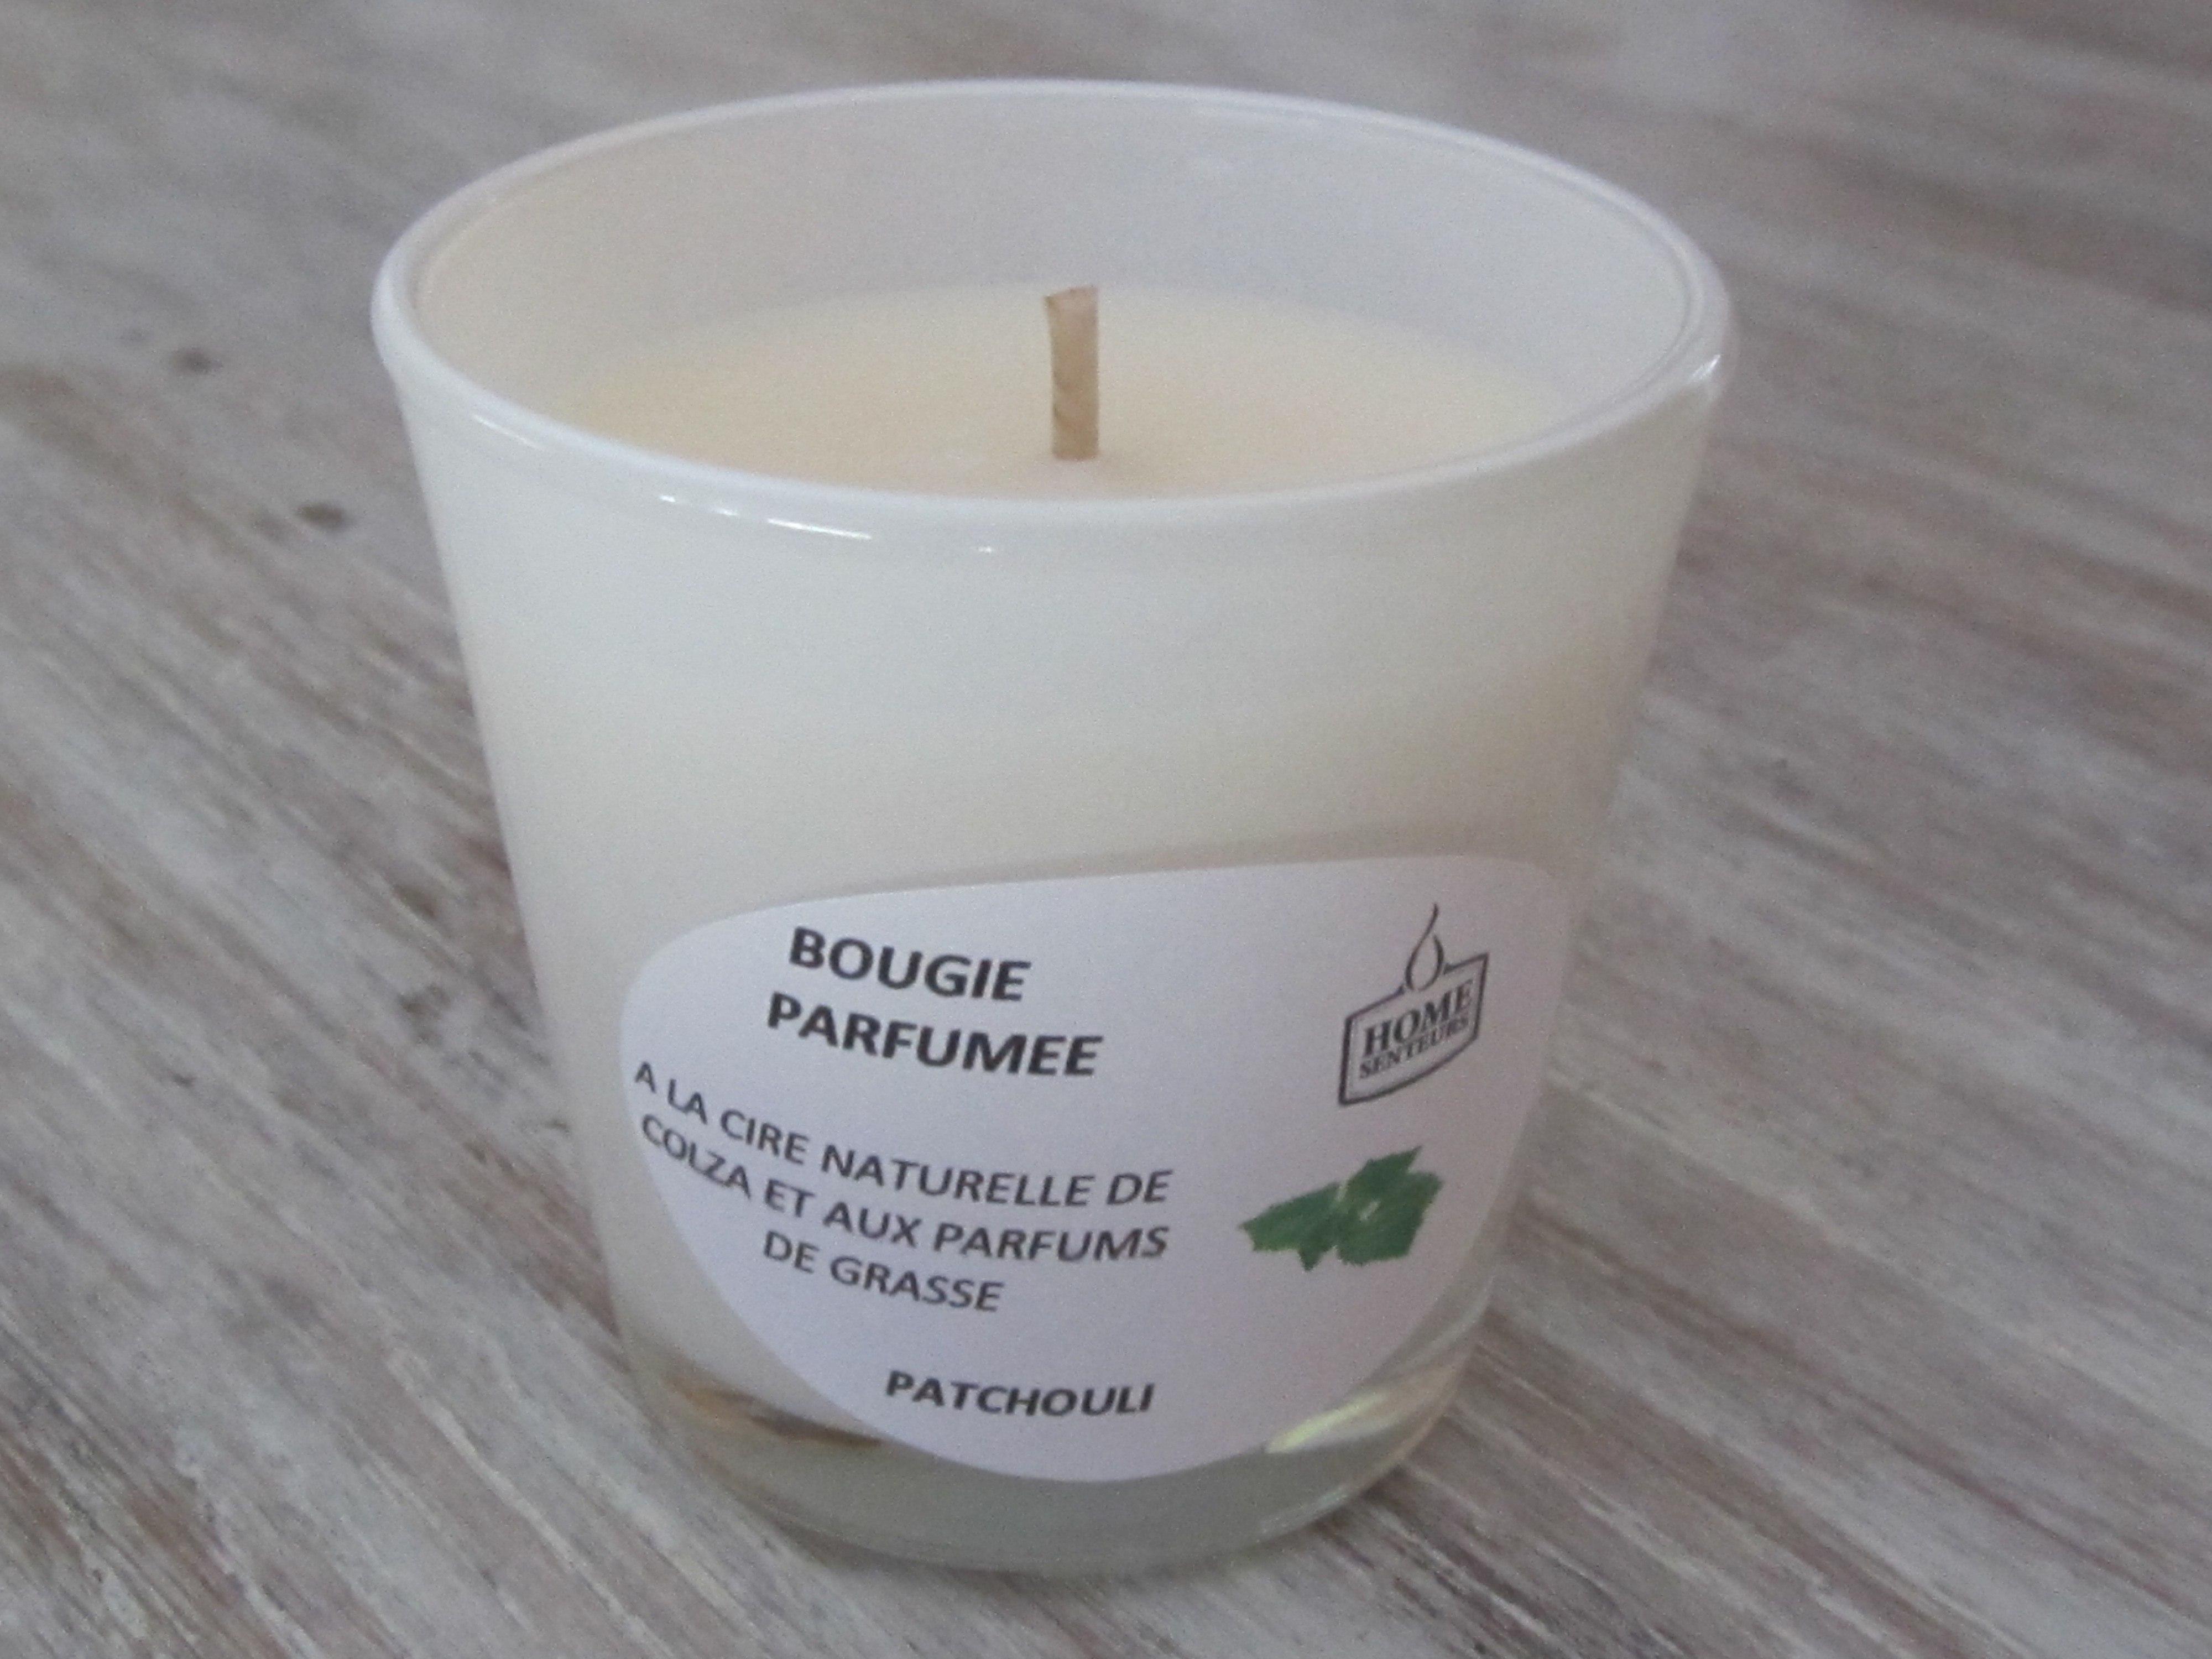 bougie artisanale parfum e en verrine opaque blanc. Black Bedroom Furniture Sets. Home Design Ideas